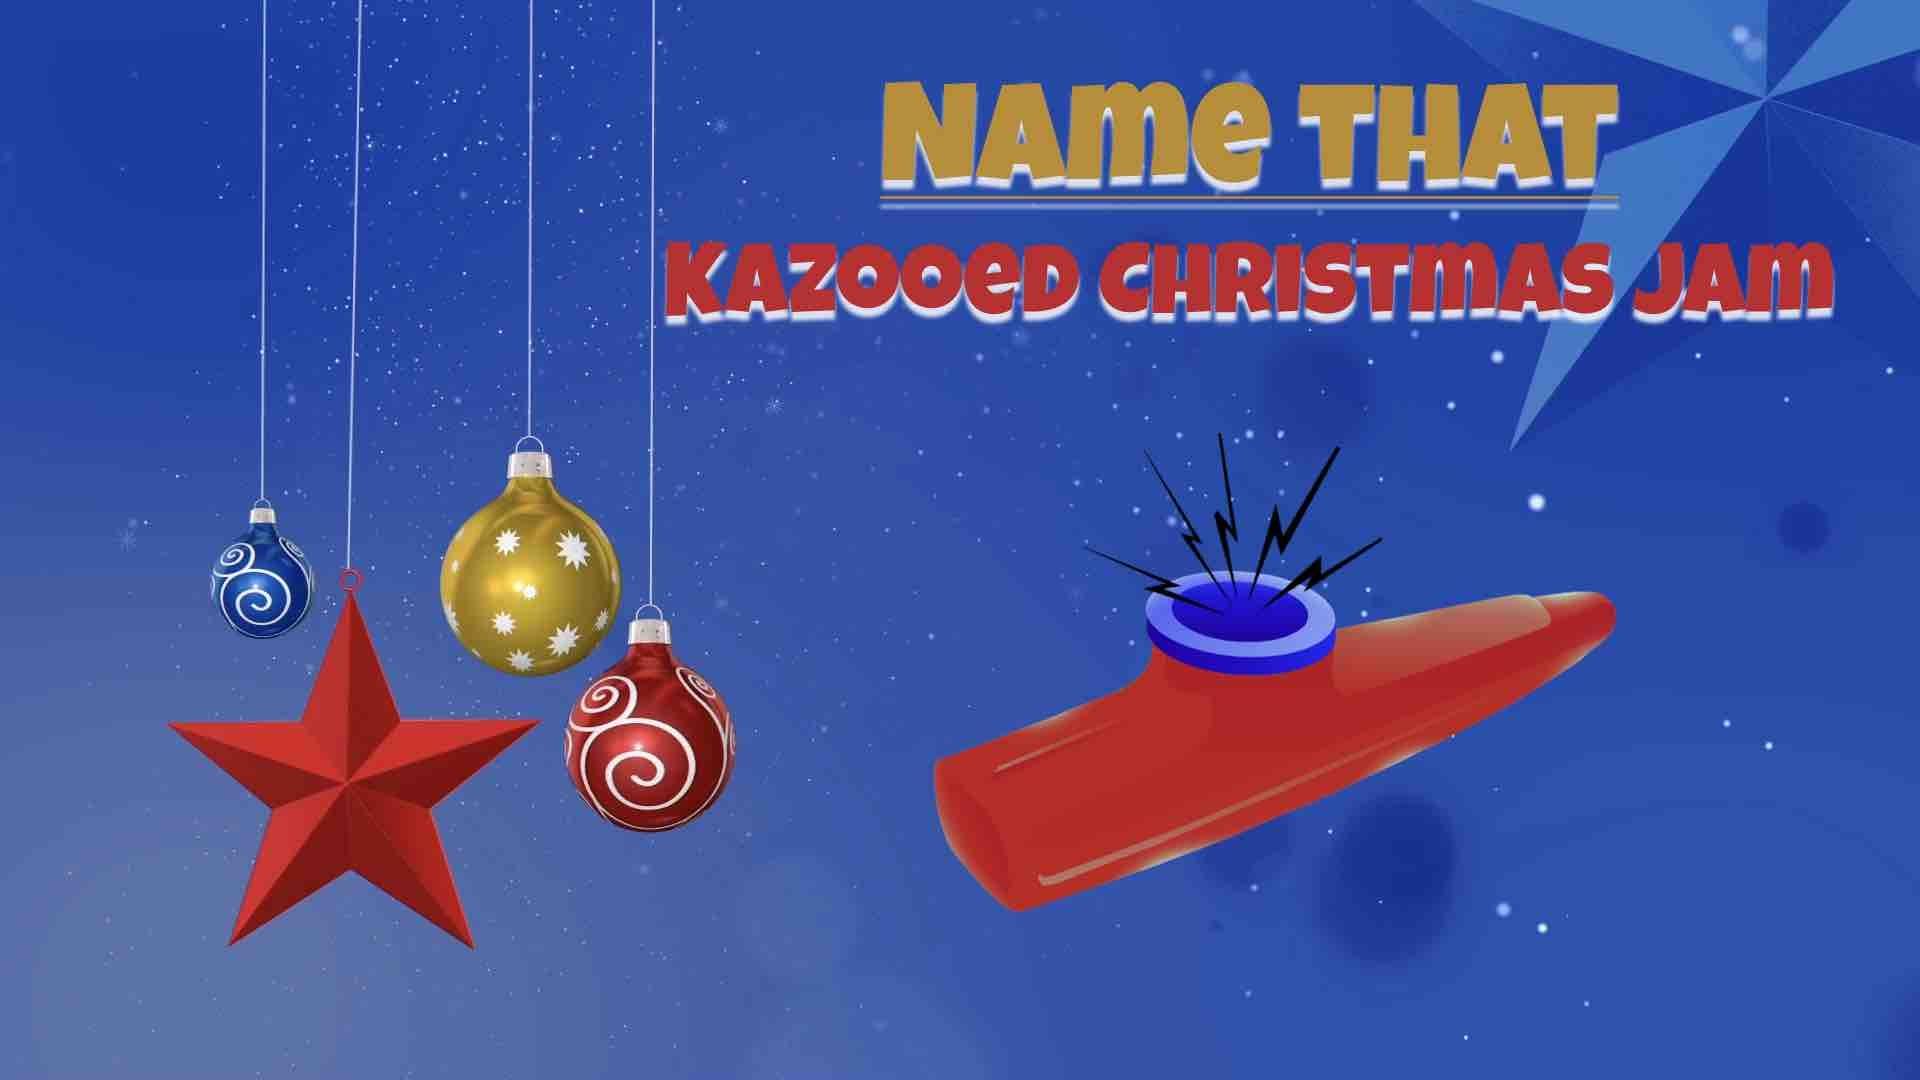 Name that Kazooed Christmas Jam